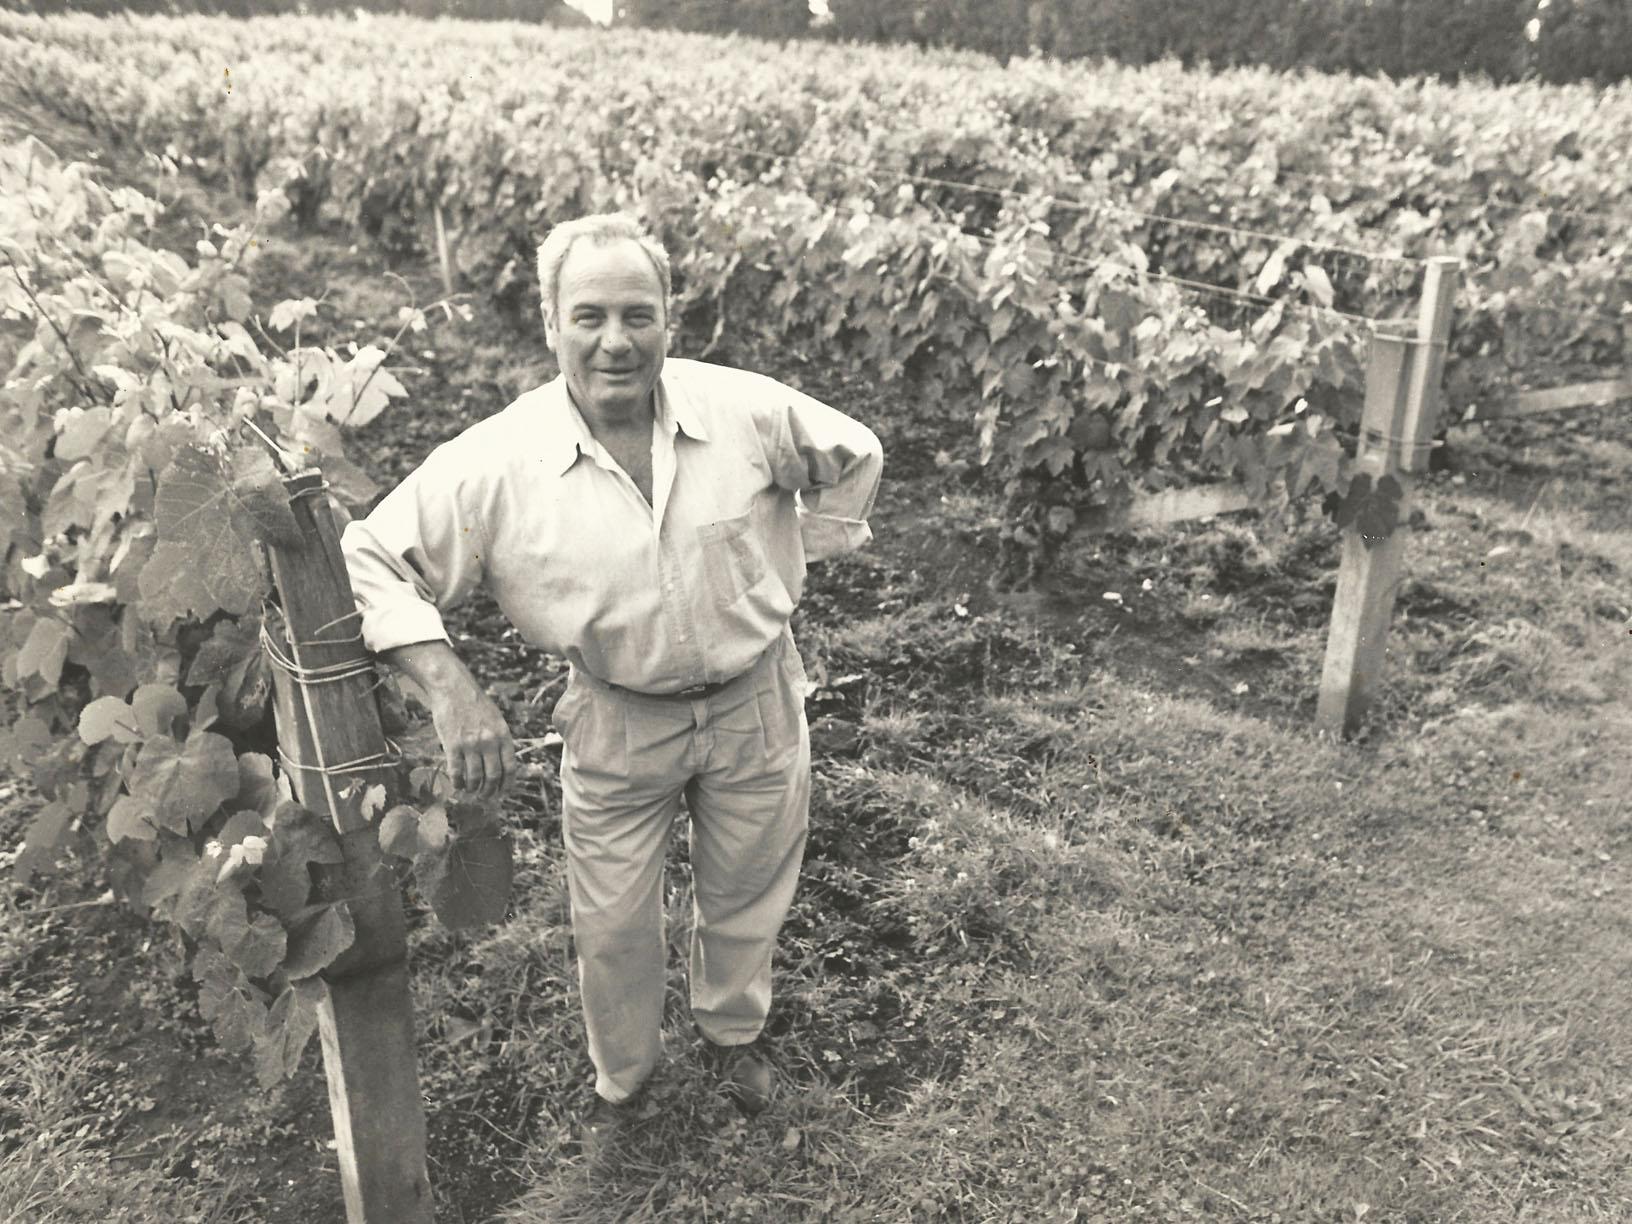 Rado Hladilo winemaker and viticulturist